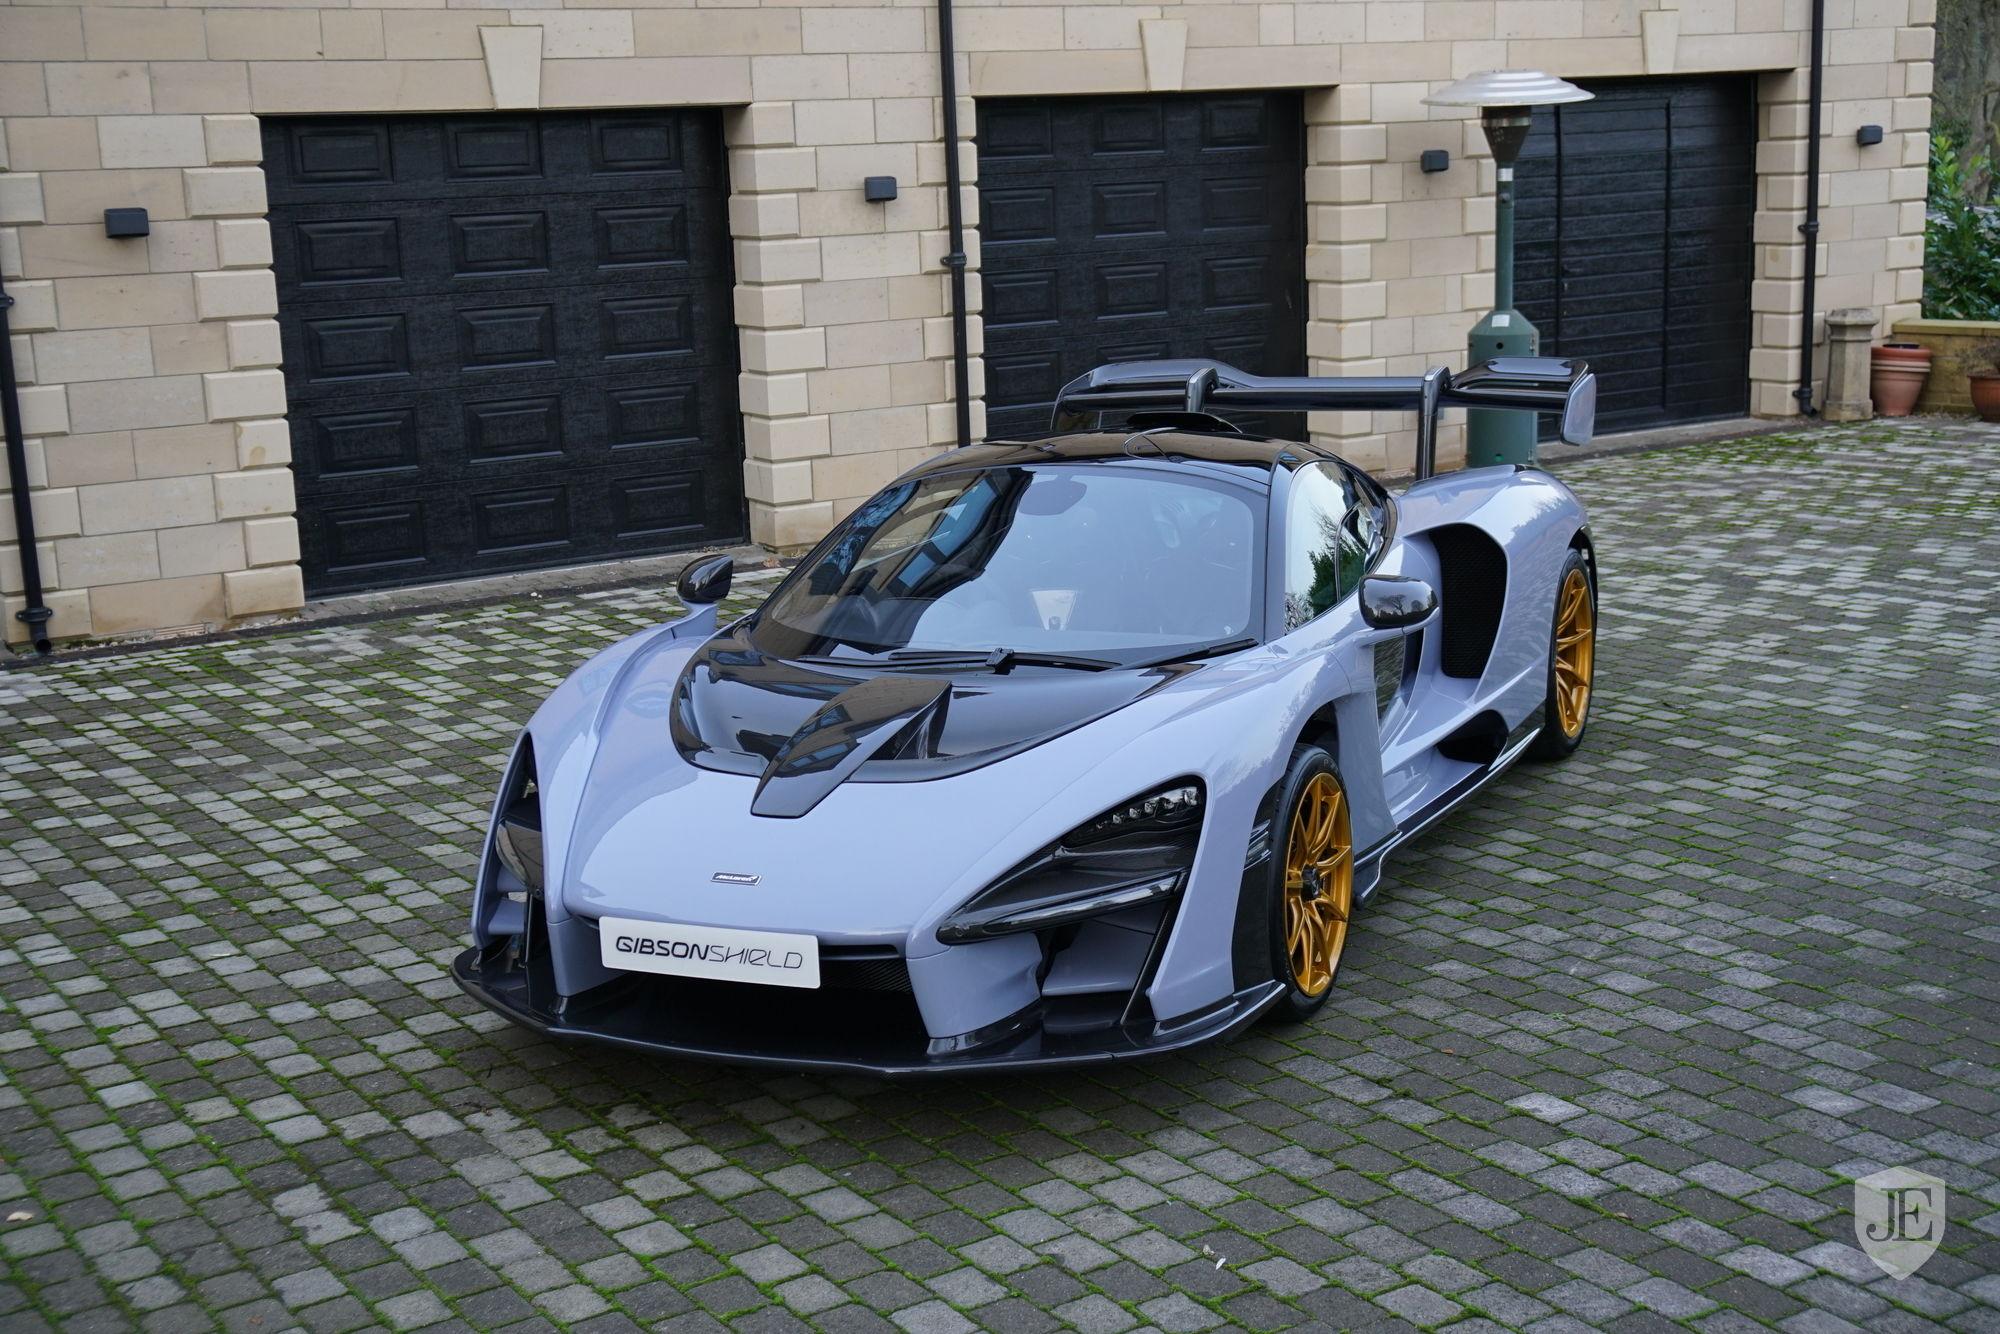 McLaren_Senna_for_sale_0000